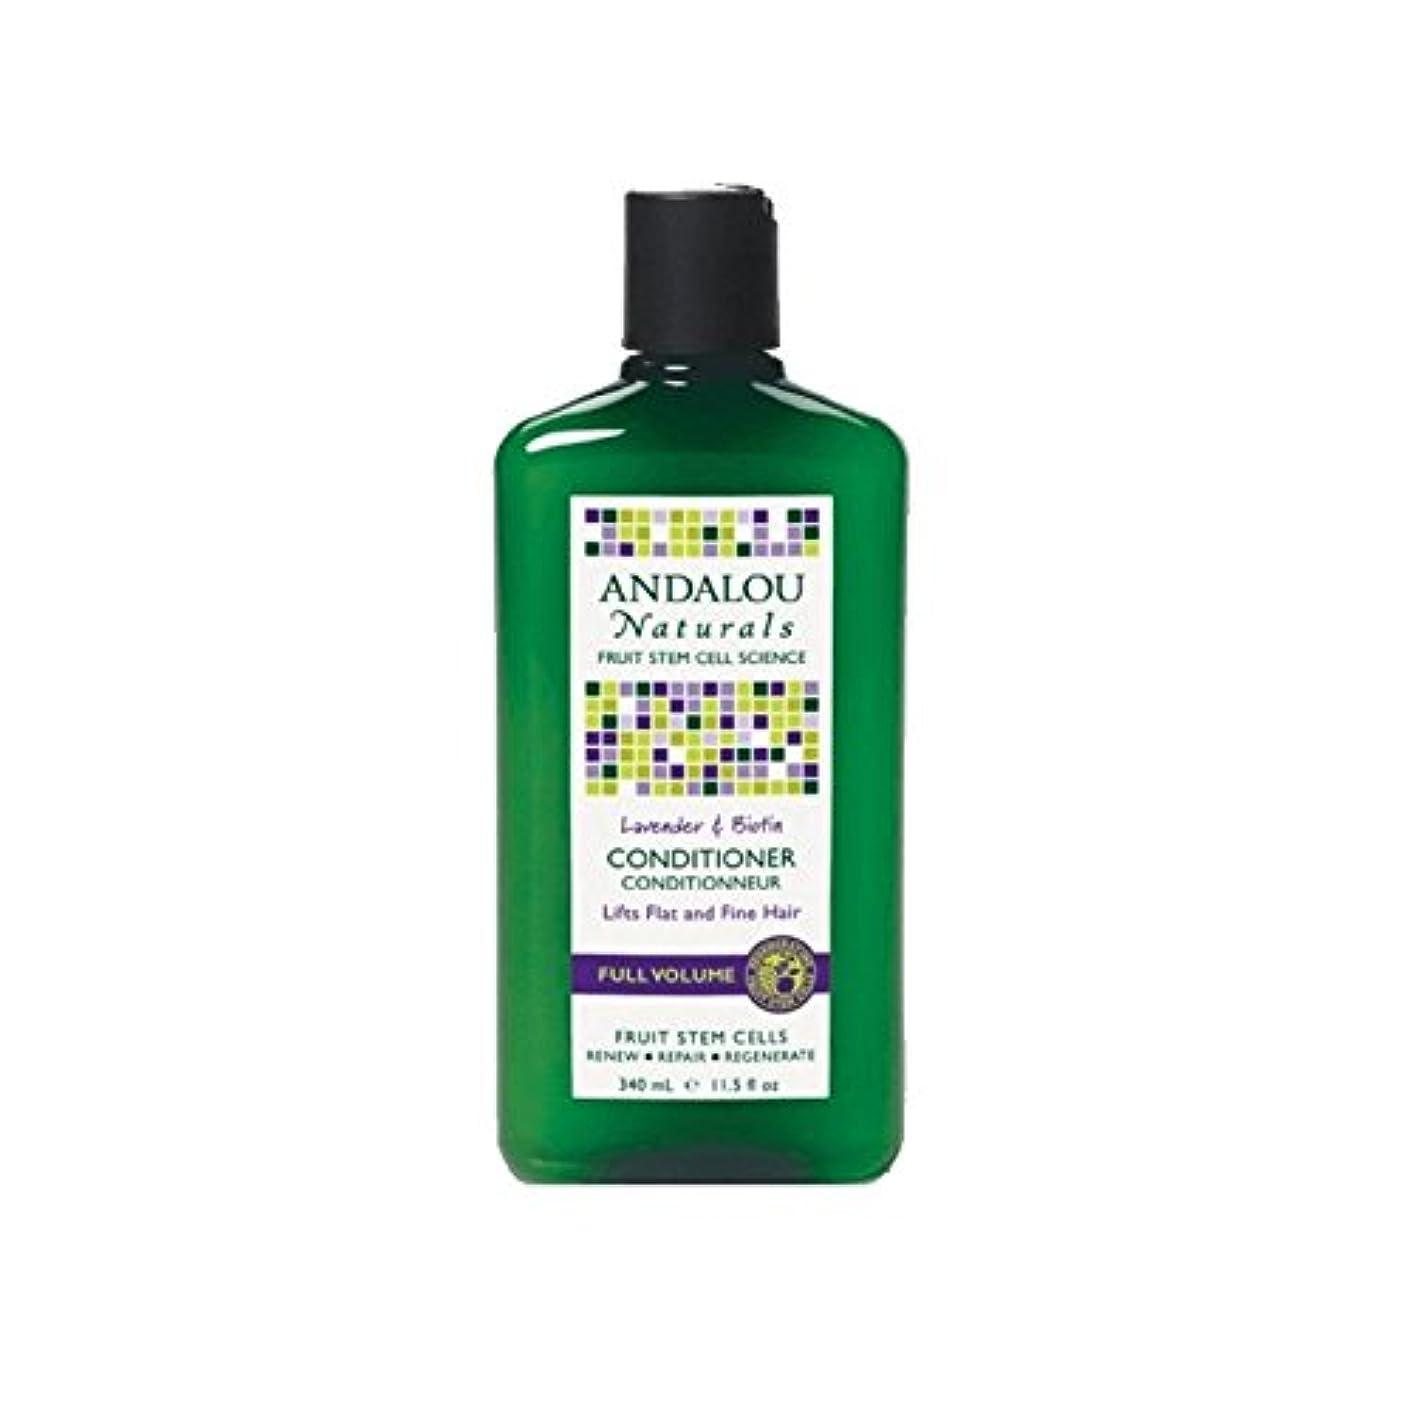 Andalou Lavender & Biotin Full Volume Conditioner 340ml (Pack of 6) - アンダロウラベンダー&ビオチンフルボリュームコンディショナー340ミリリットル...